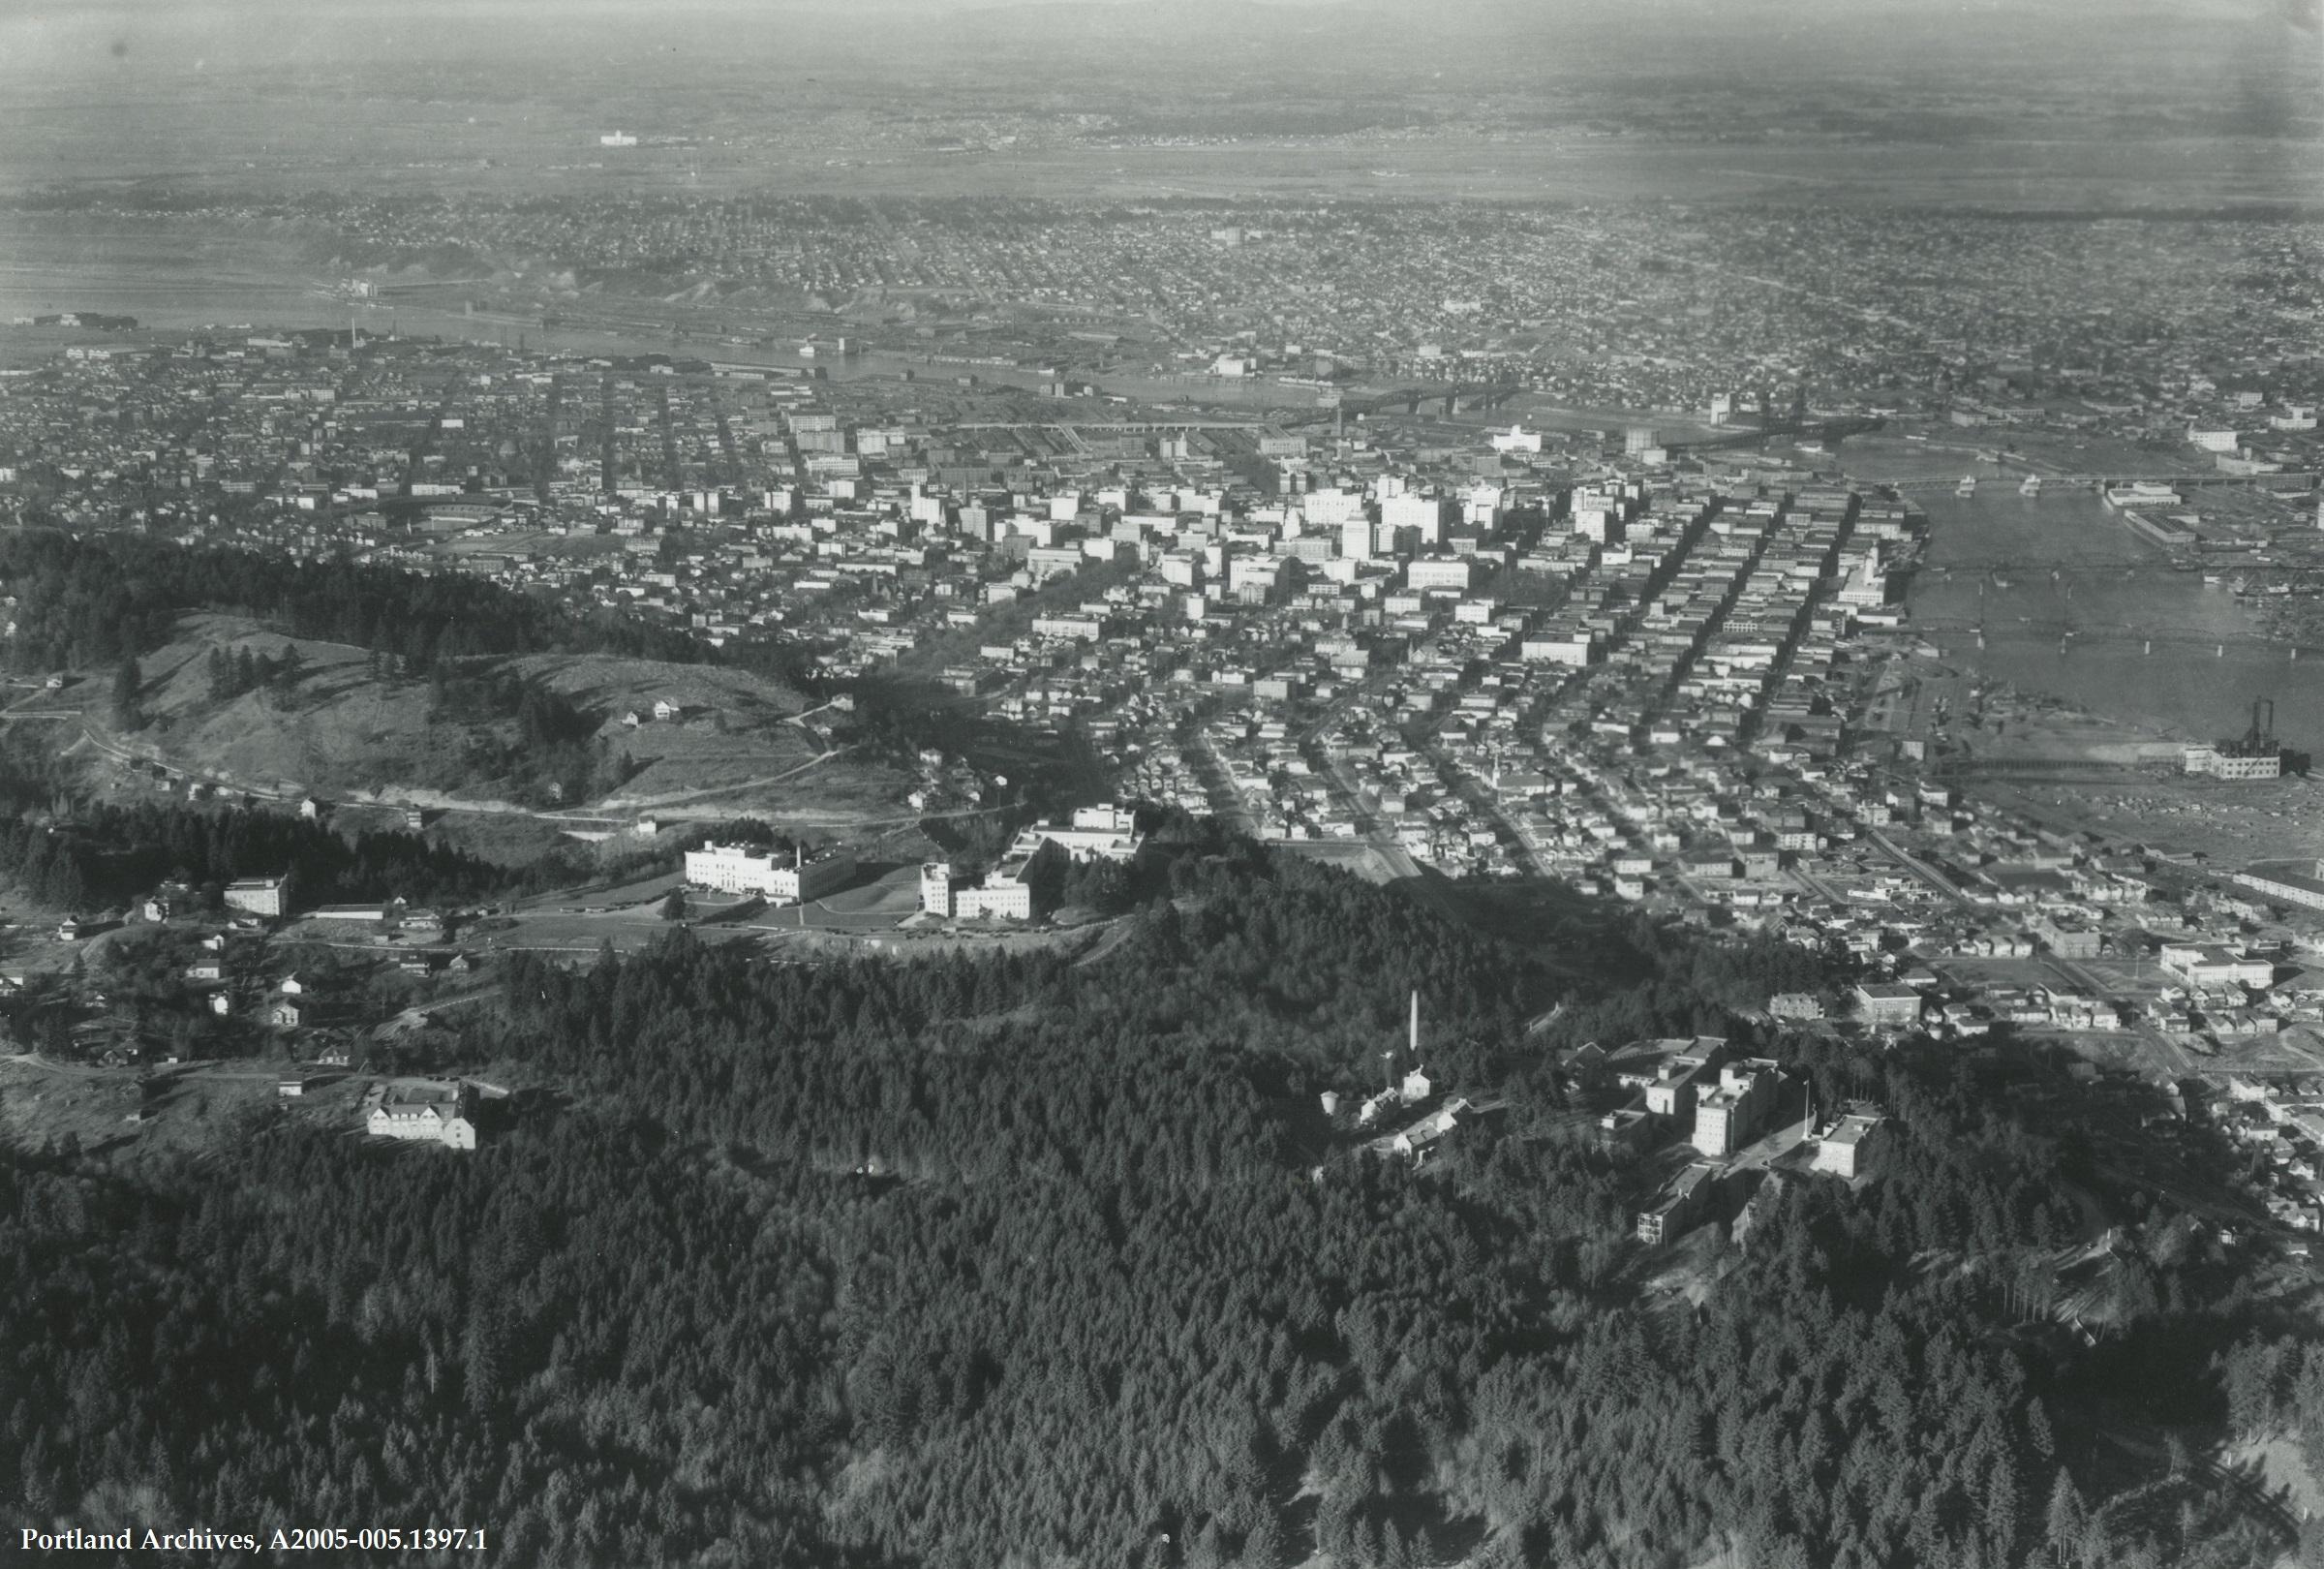 City of Portland Archives, Oregon, A2005-005.1397.1